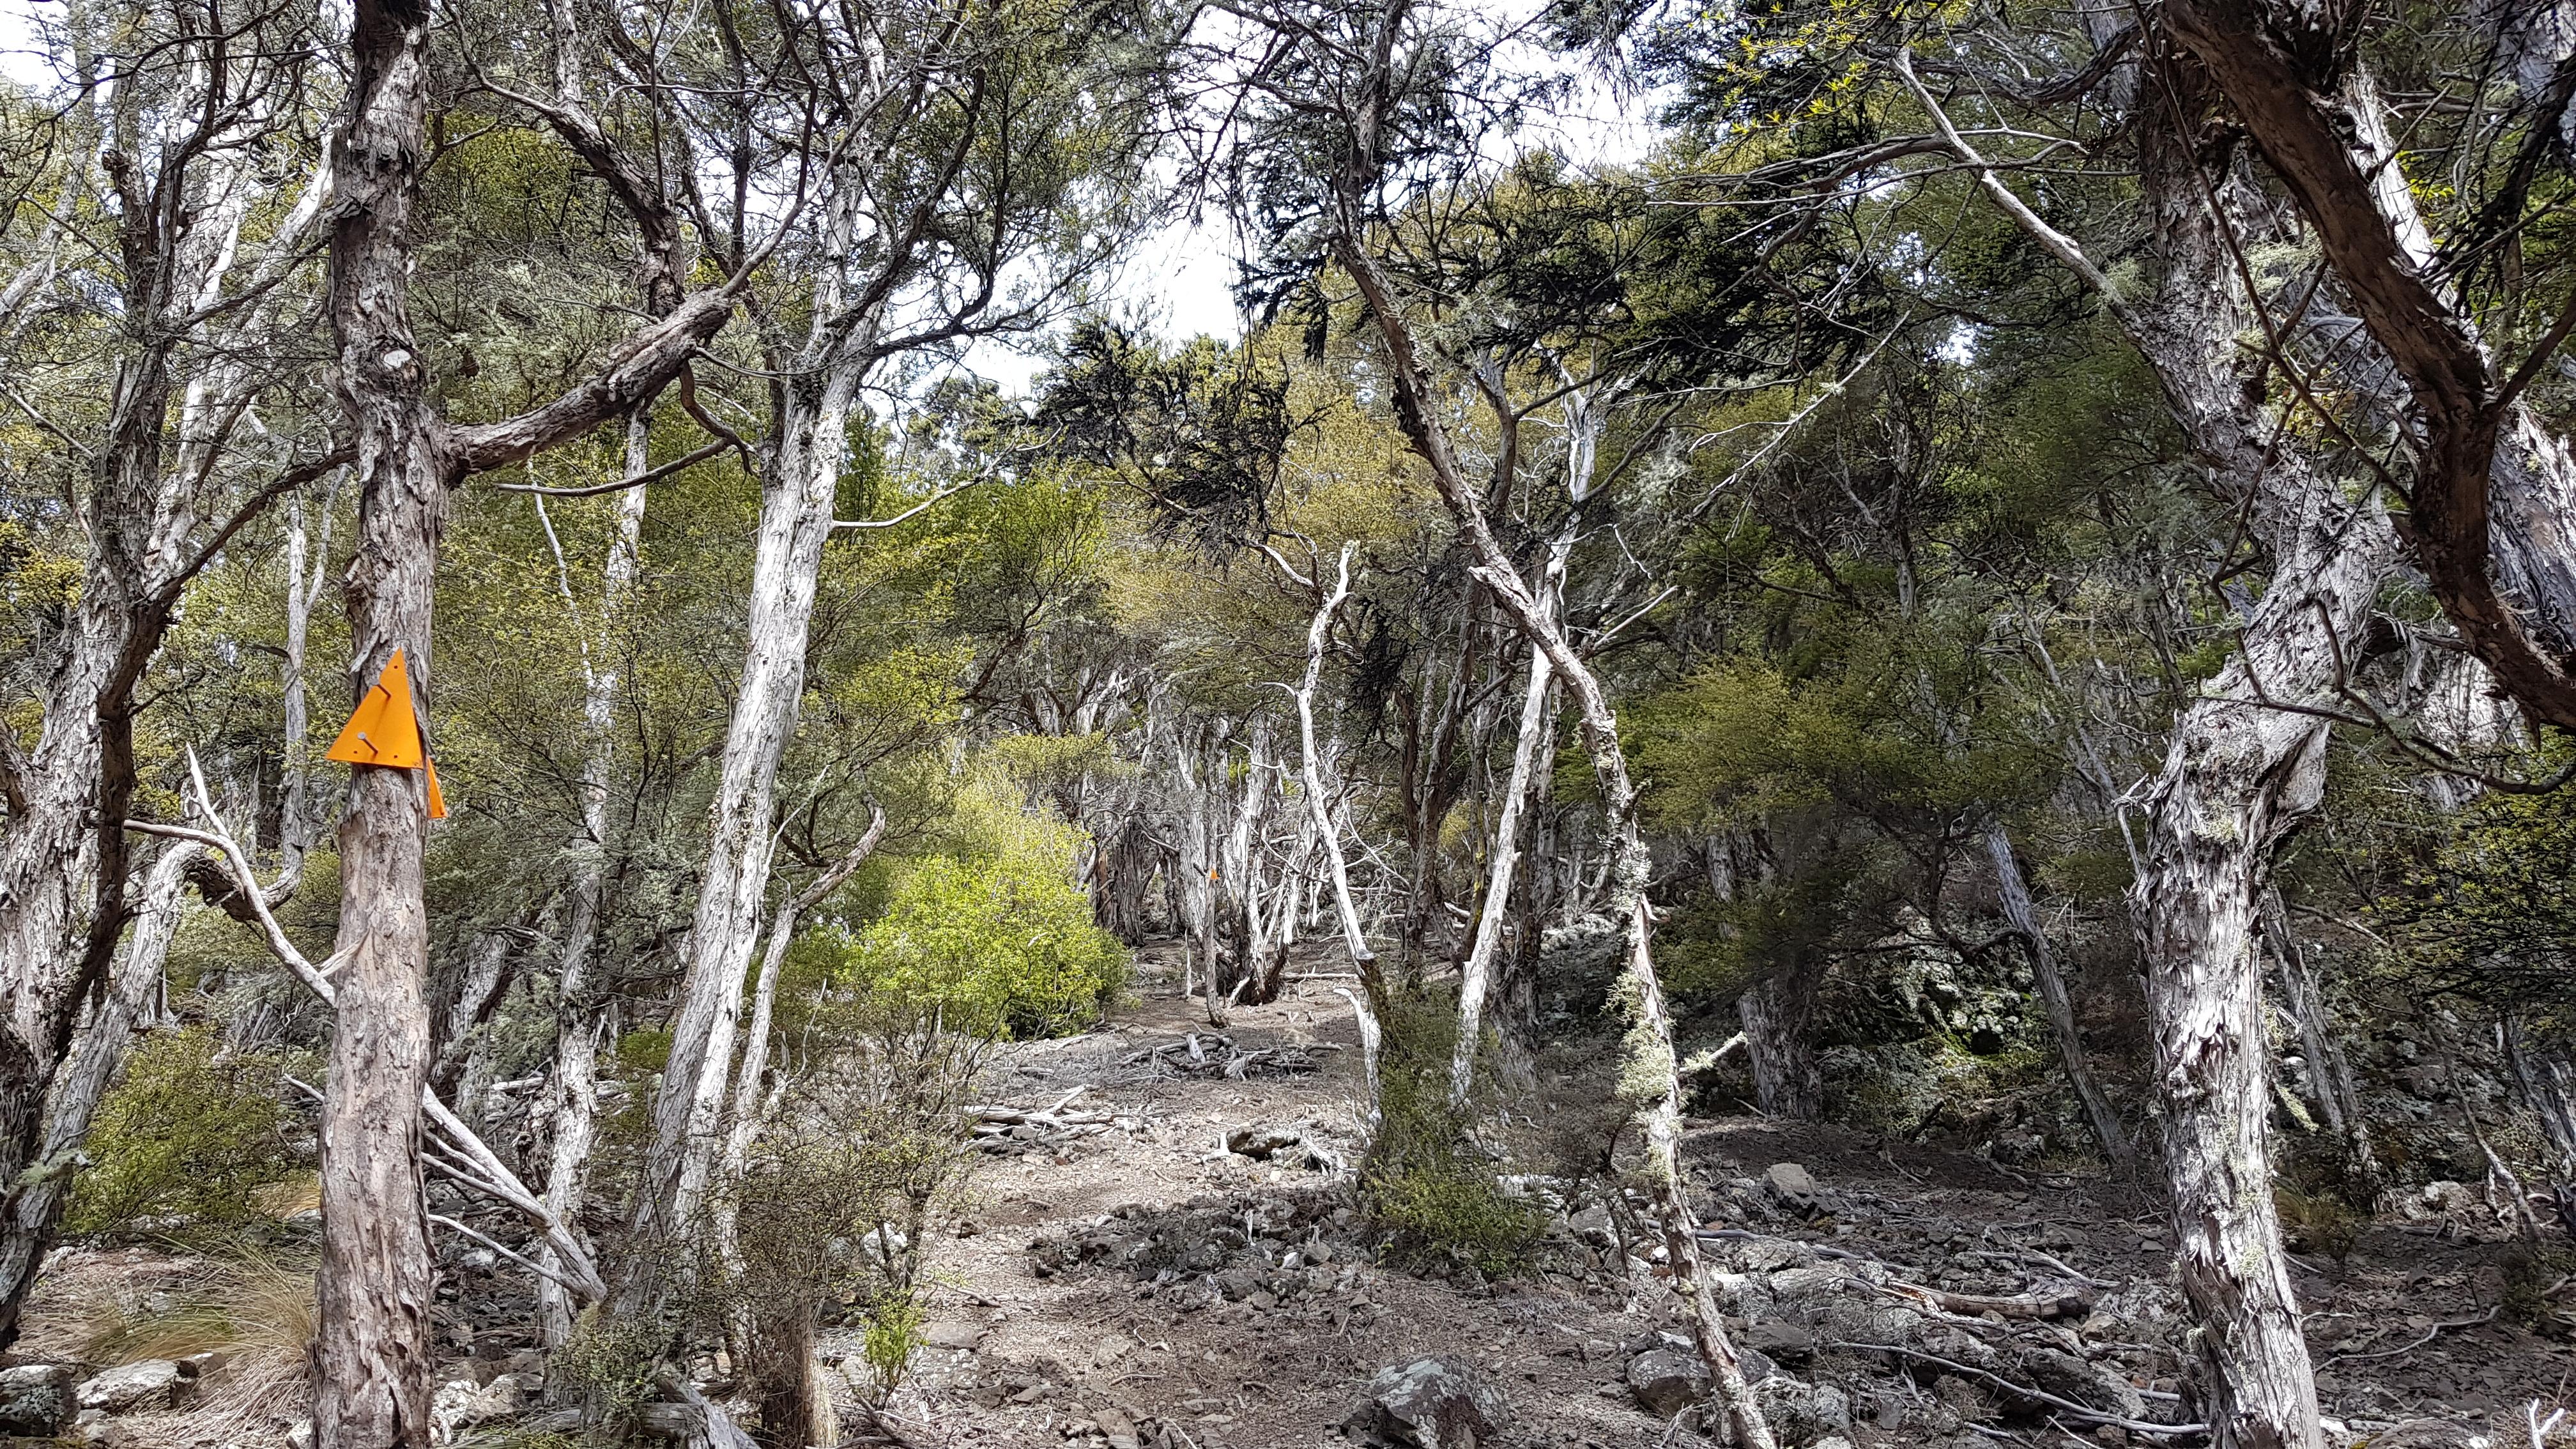 Climbing up to Black Birch bivouac